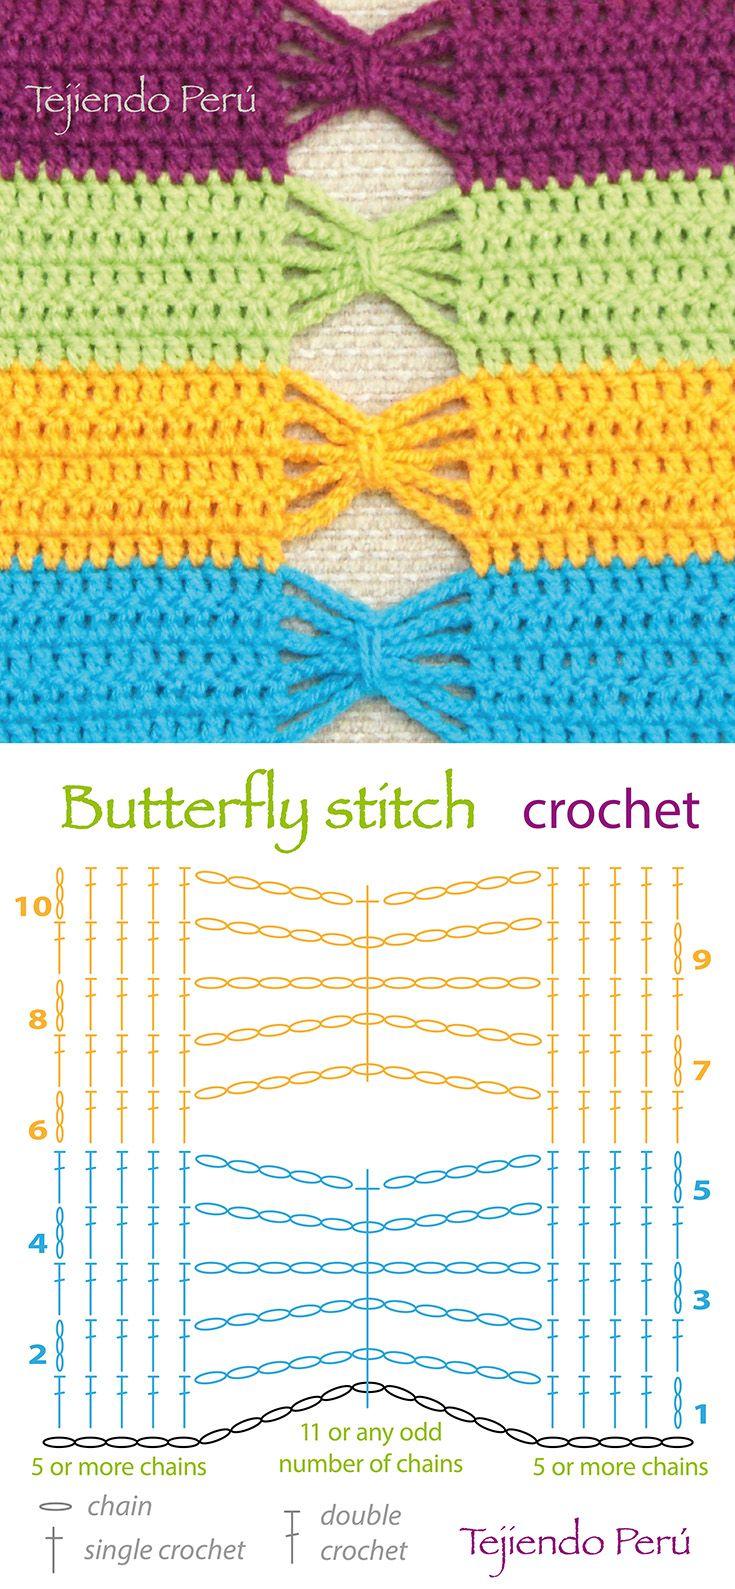 Crochet: butterfly stitch chart (diagram or pattern)!